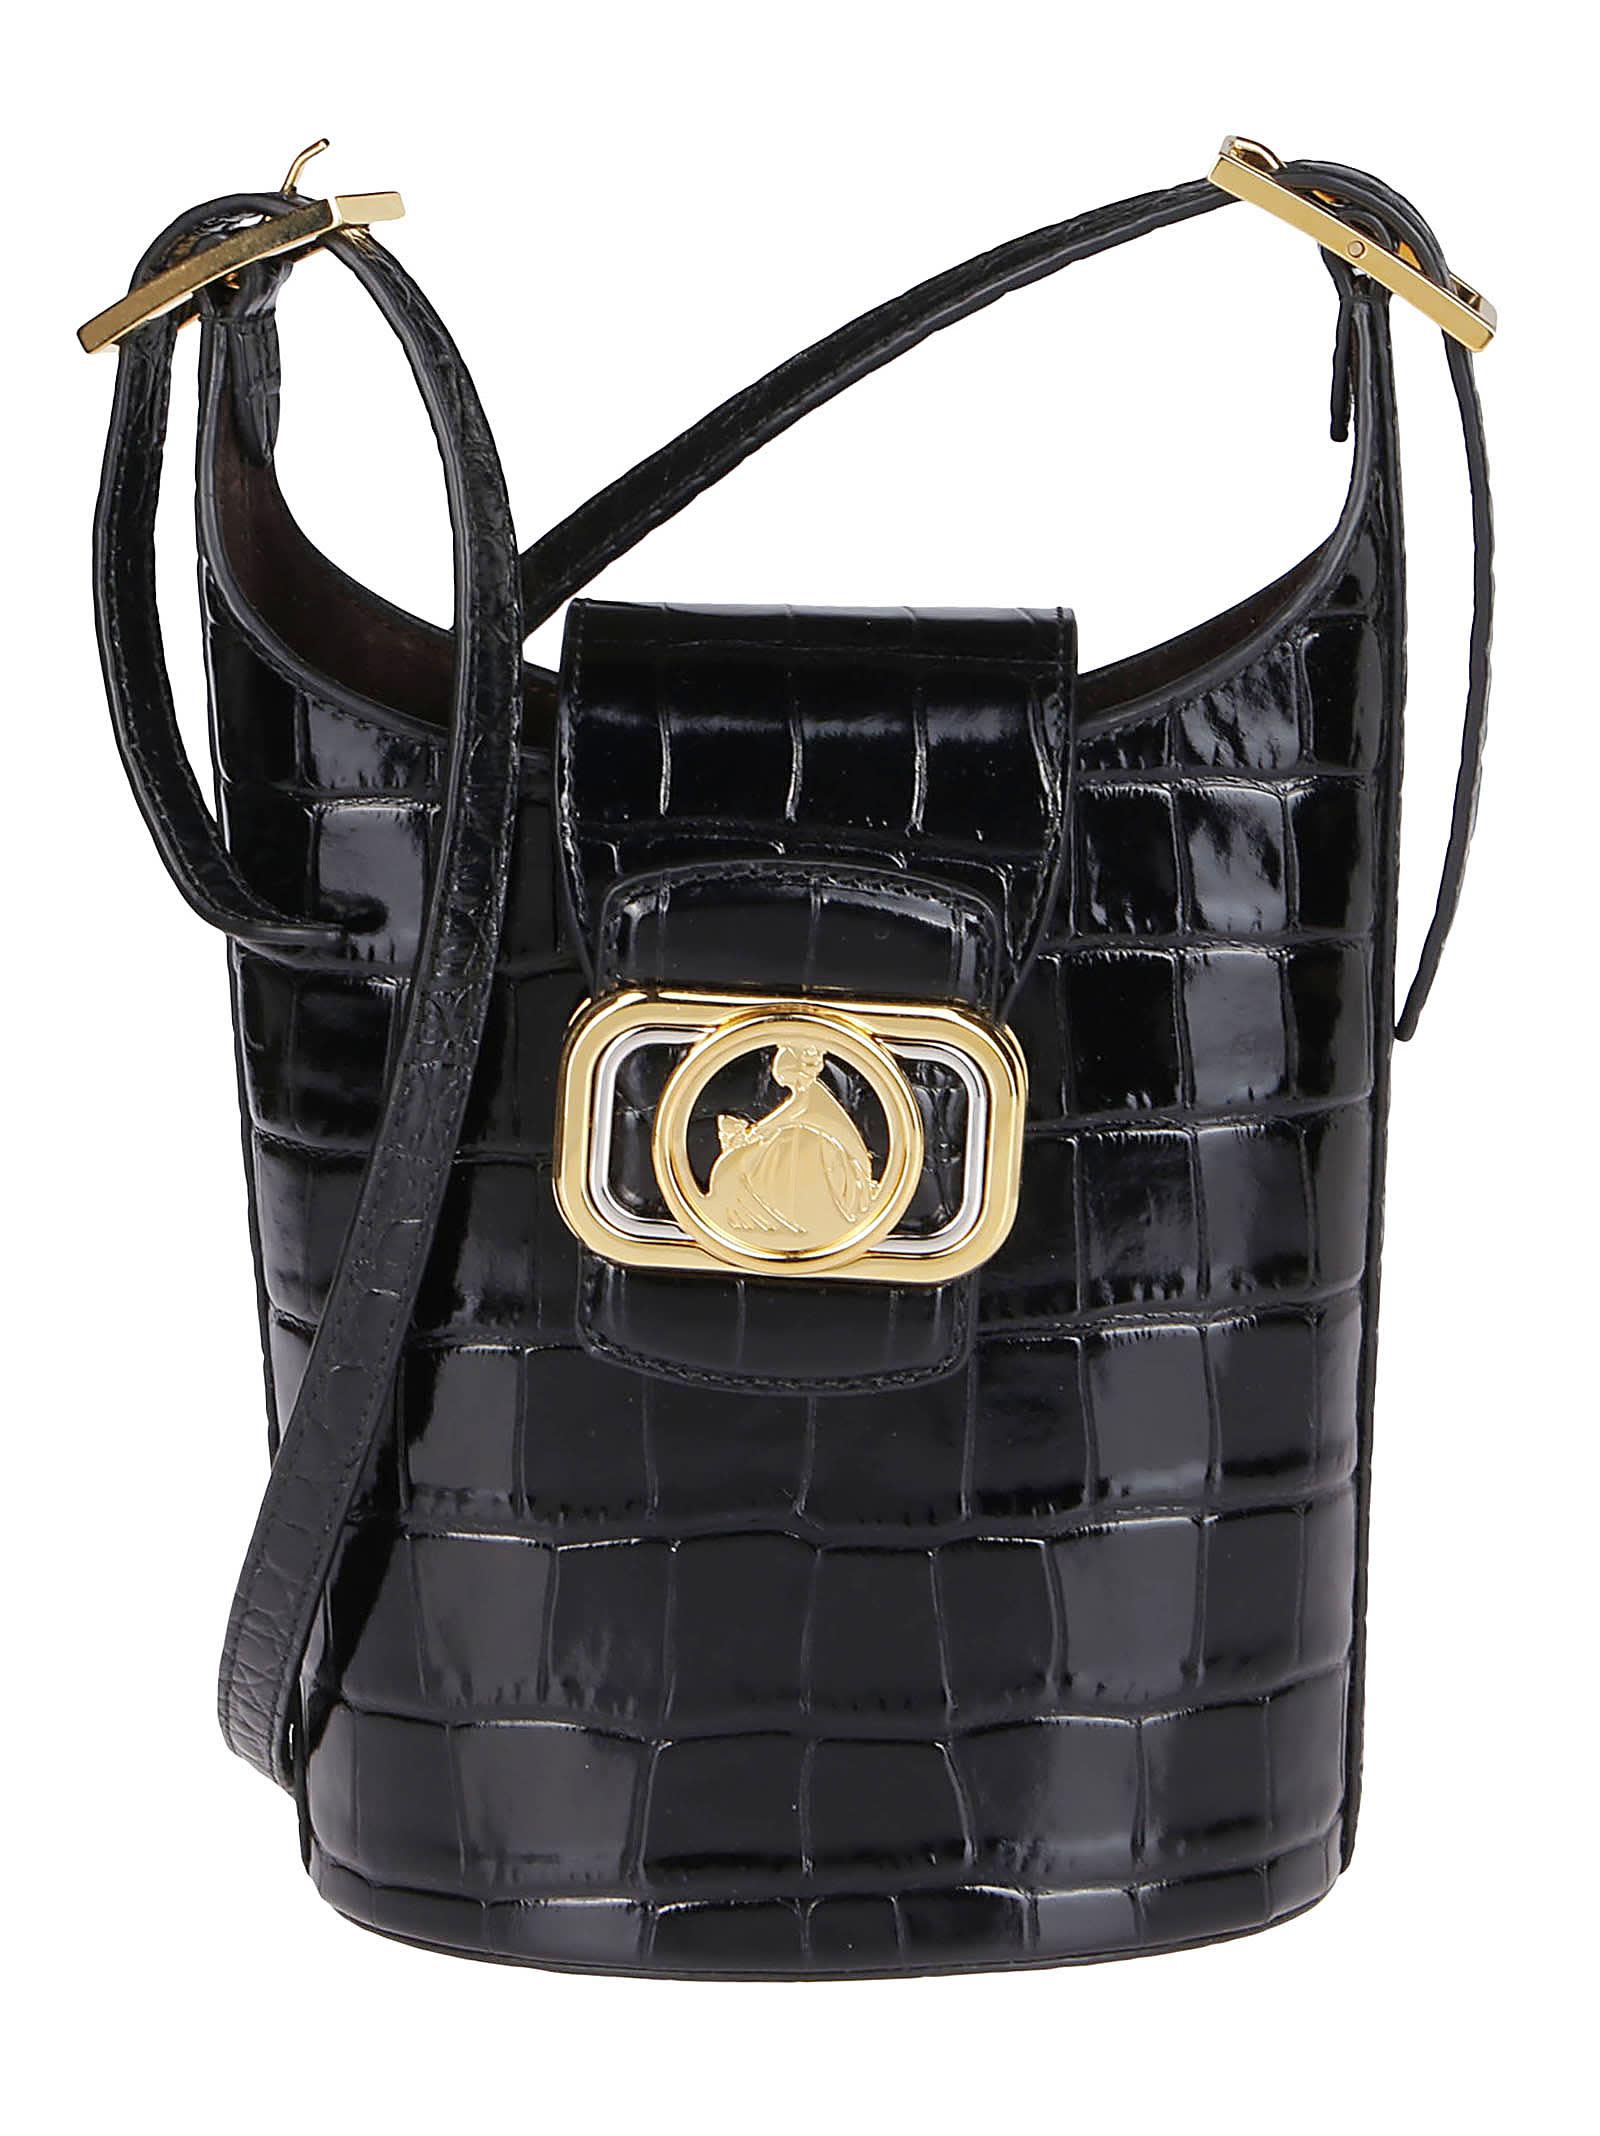 Lanvin BLACK LEATHER SWAN BUCKET BAG